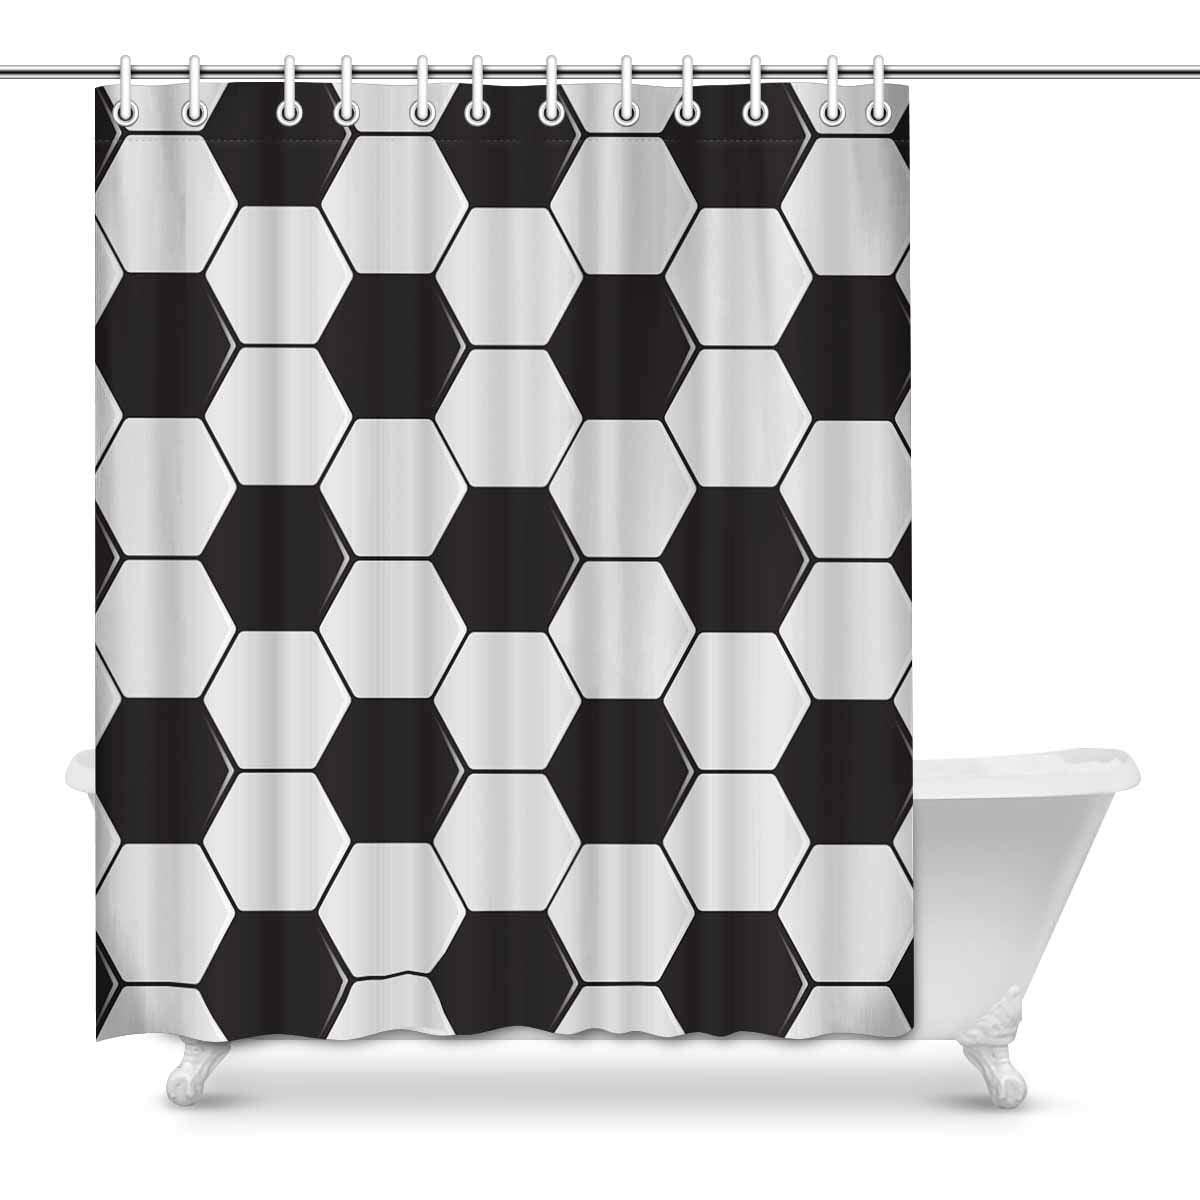 Mkhert Black White Soccer Ball Sports Decor Waterproof Polyester Bathroom Shower Curtain Bath Decorations Hooks 60x72 Inch Walmart Com